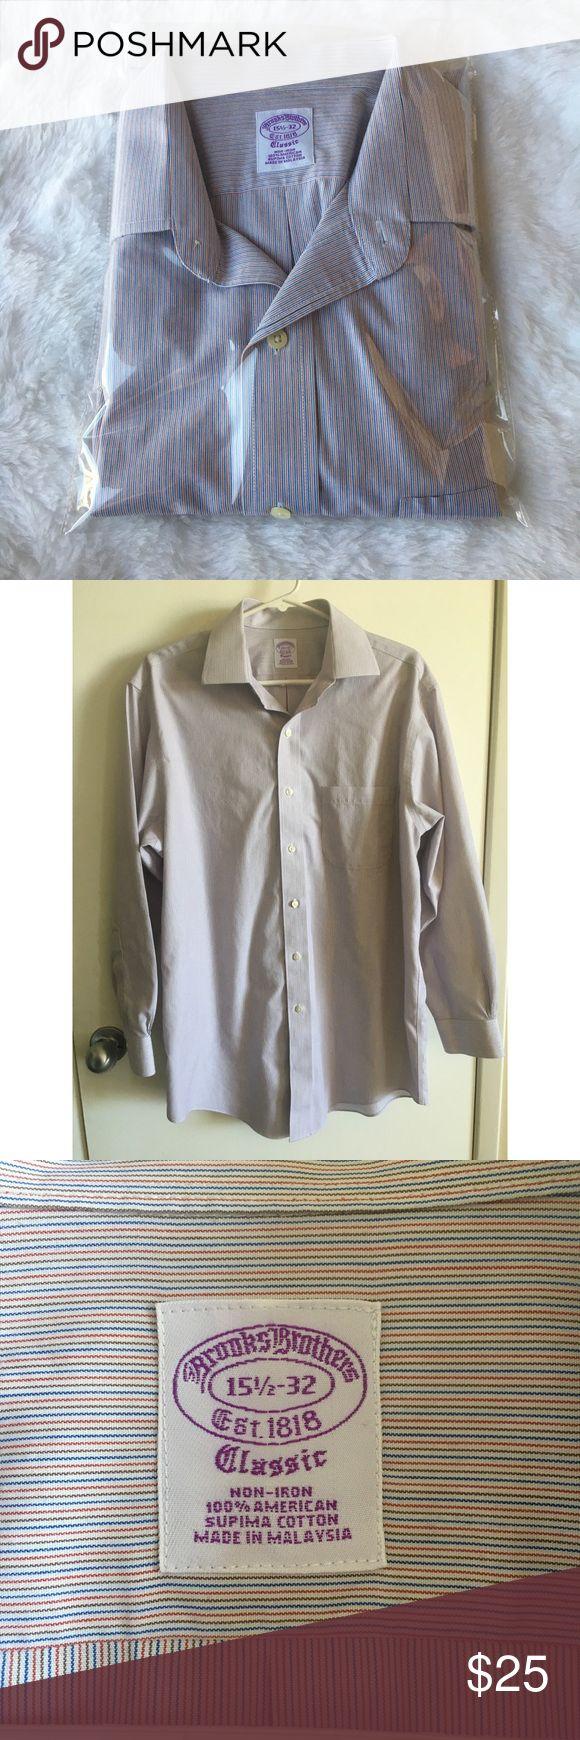 Brooks Brothers Classic Dress Shirt 15 1/2- 32 Brooks Brothers  Classic Fit  Non iron dress shirt  15 1/2- 32  Striped  In excellent condition Brooks Brothers Shirts Dress Shirts